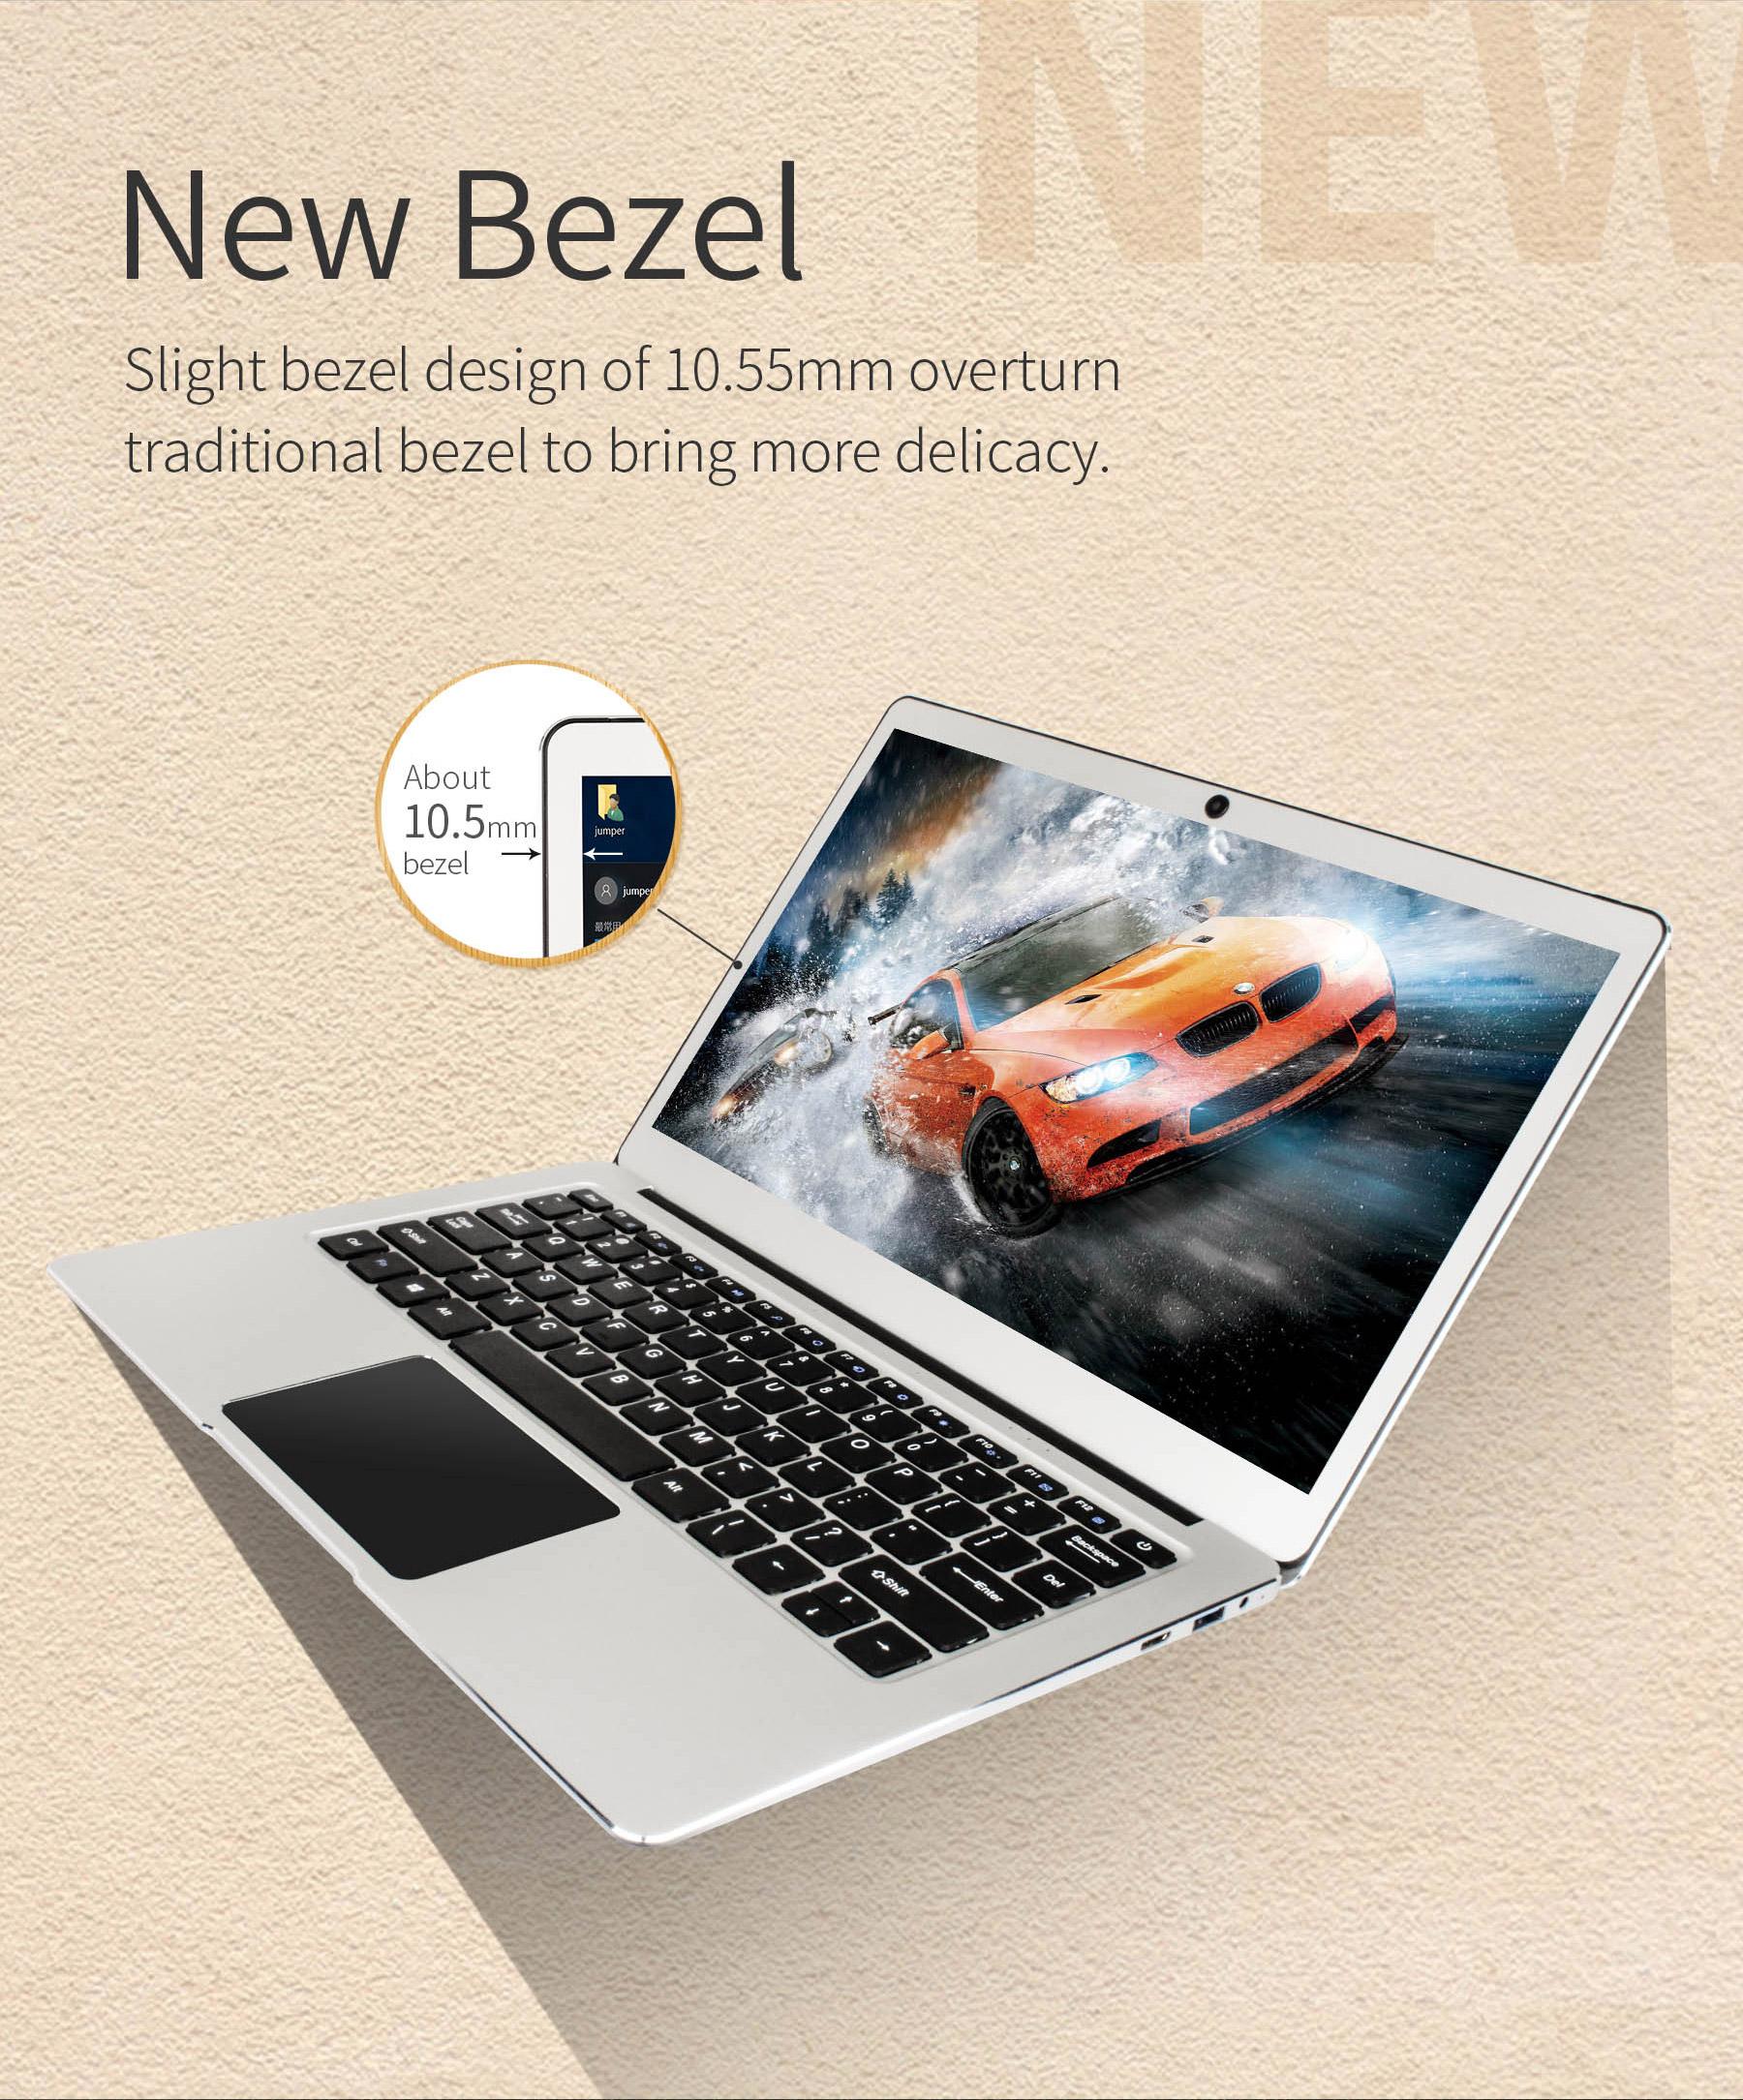 Jumper EZBOOK 3 PRO 13.3 Inch Notebook Windows 10 Intel Apollo Lake N3450 Quad Core 6GB RAM 64G eMMC / 128GB